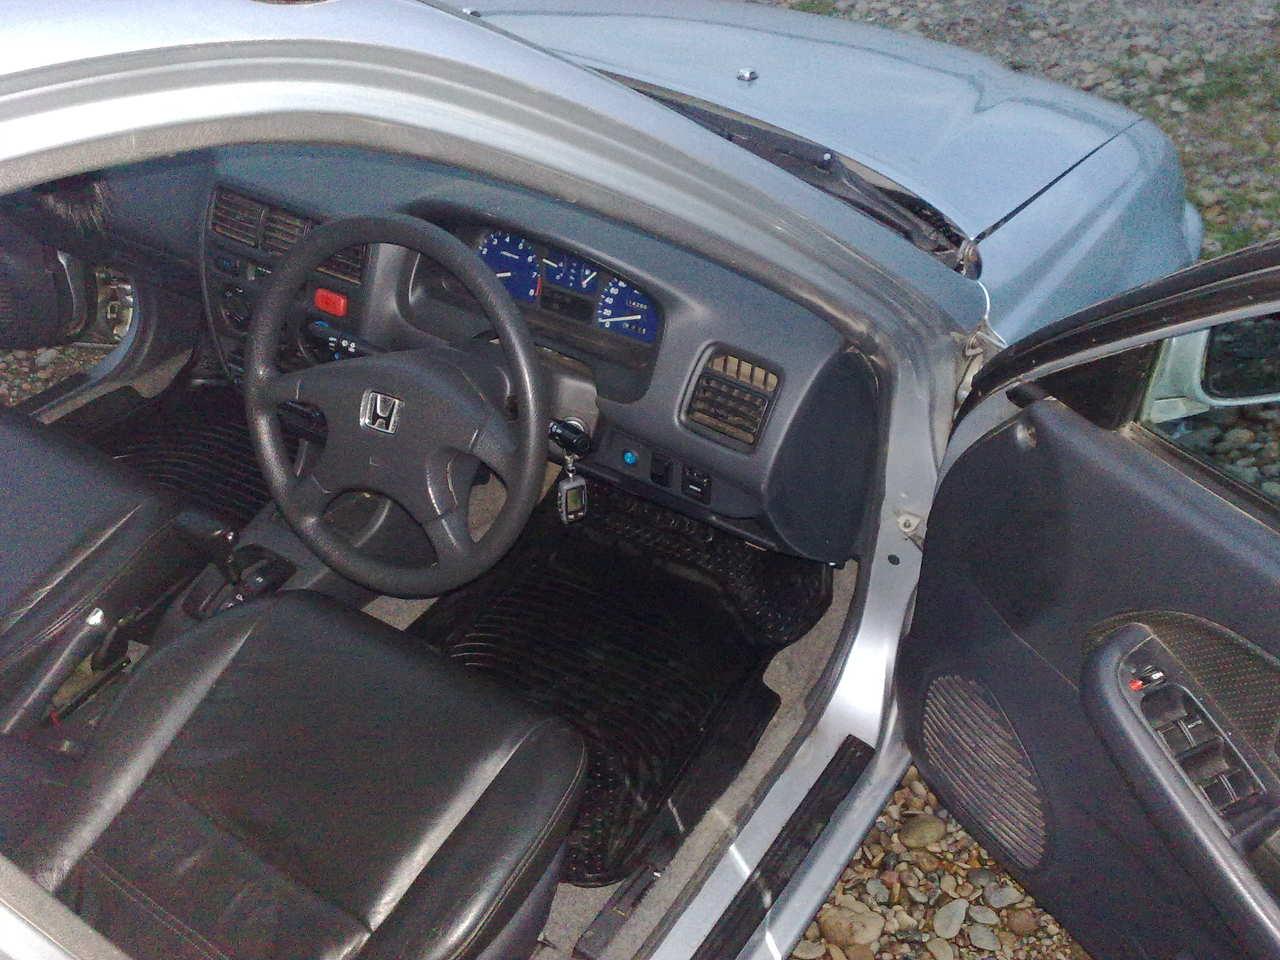 2000 Honda City Pictures 1 5l Gasoline Ff Automatic For Sale